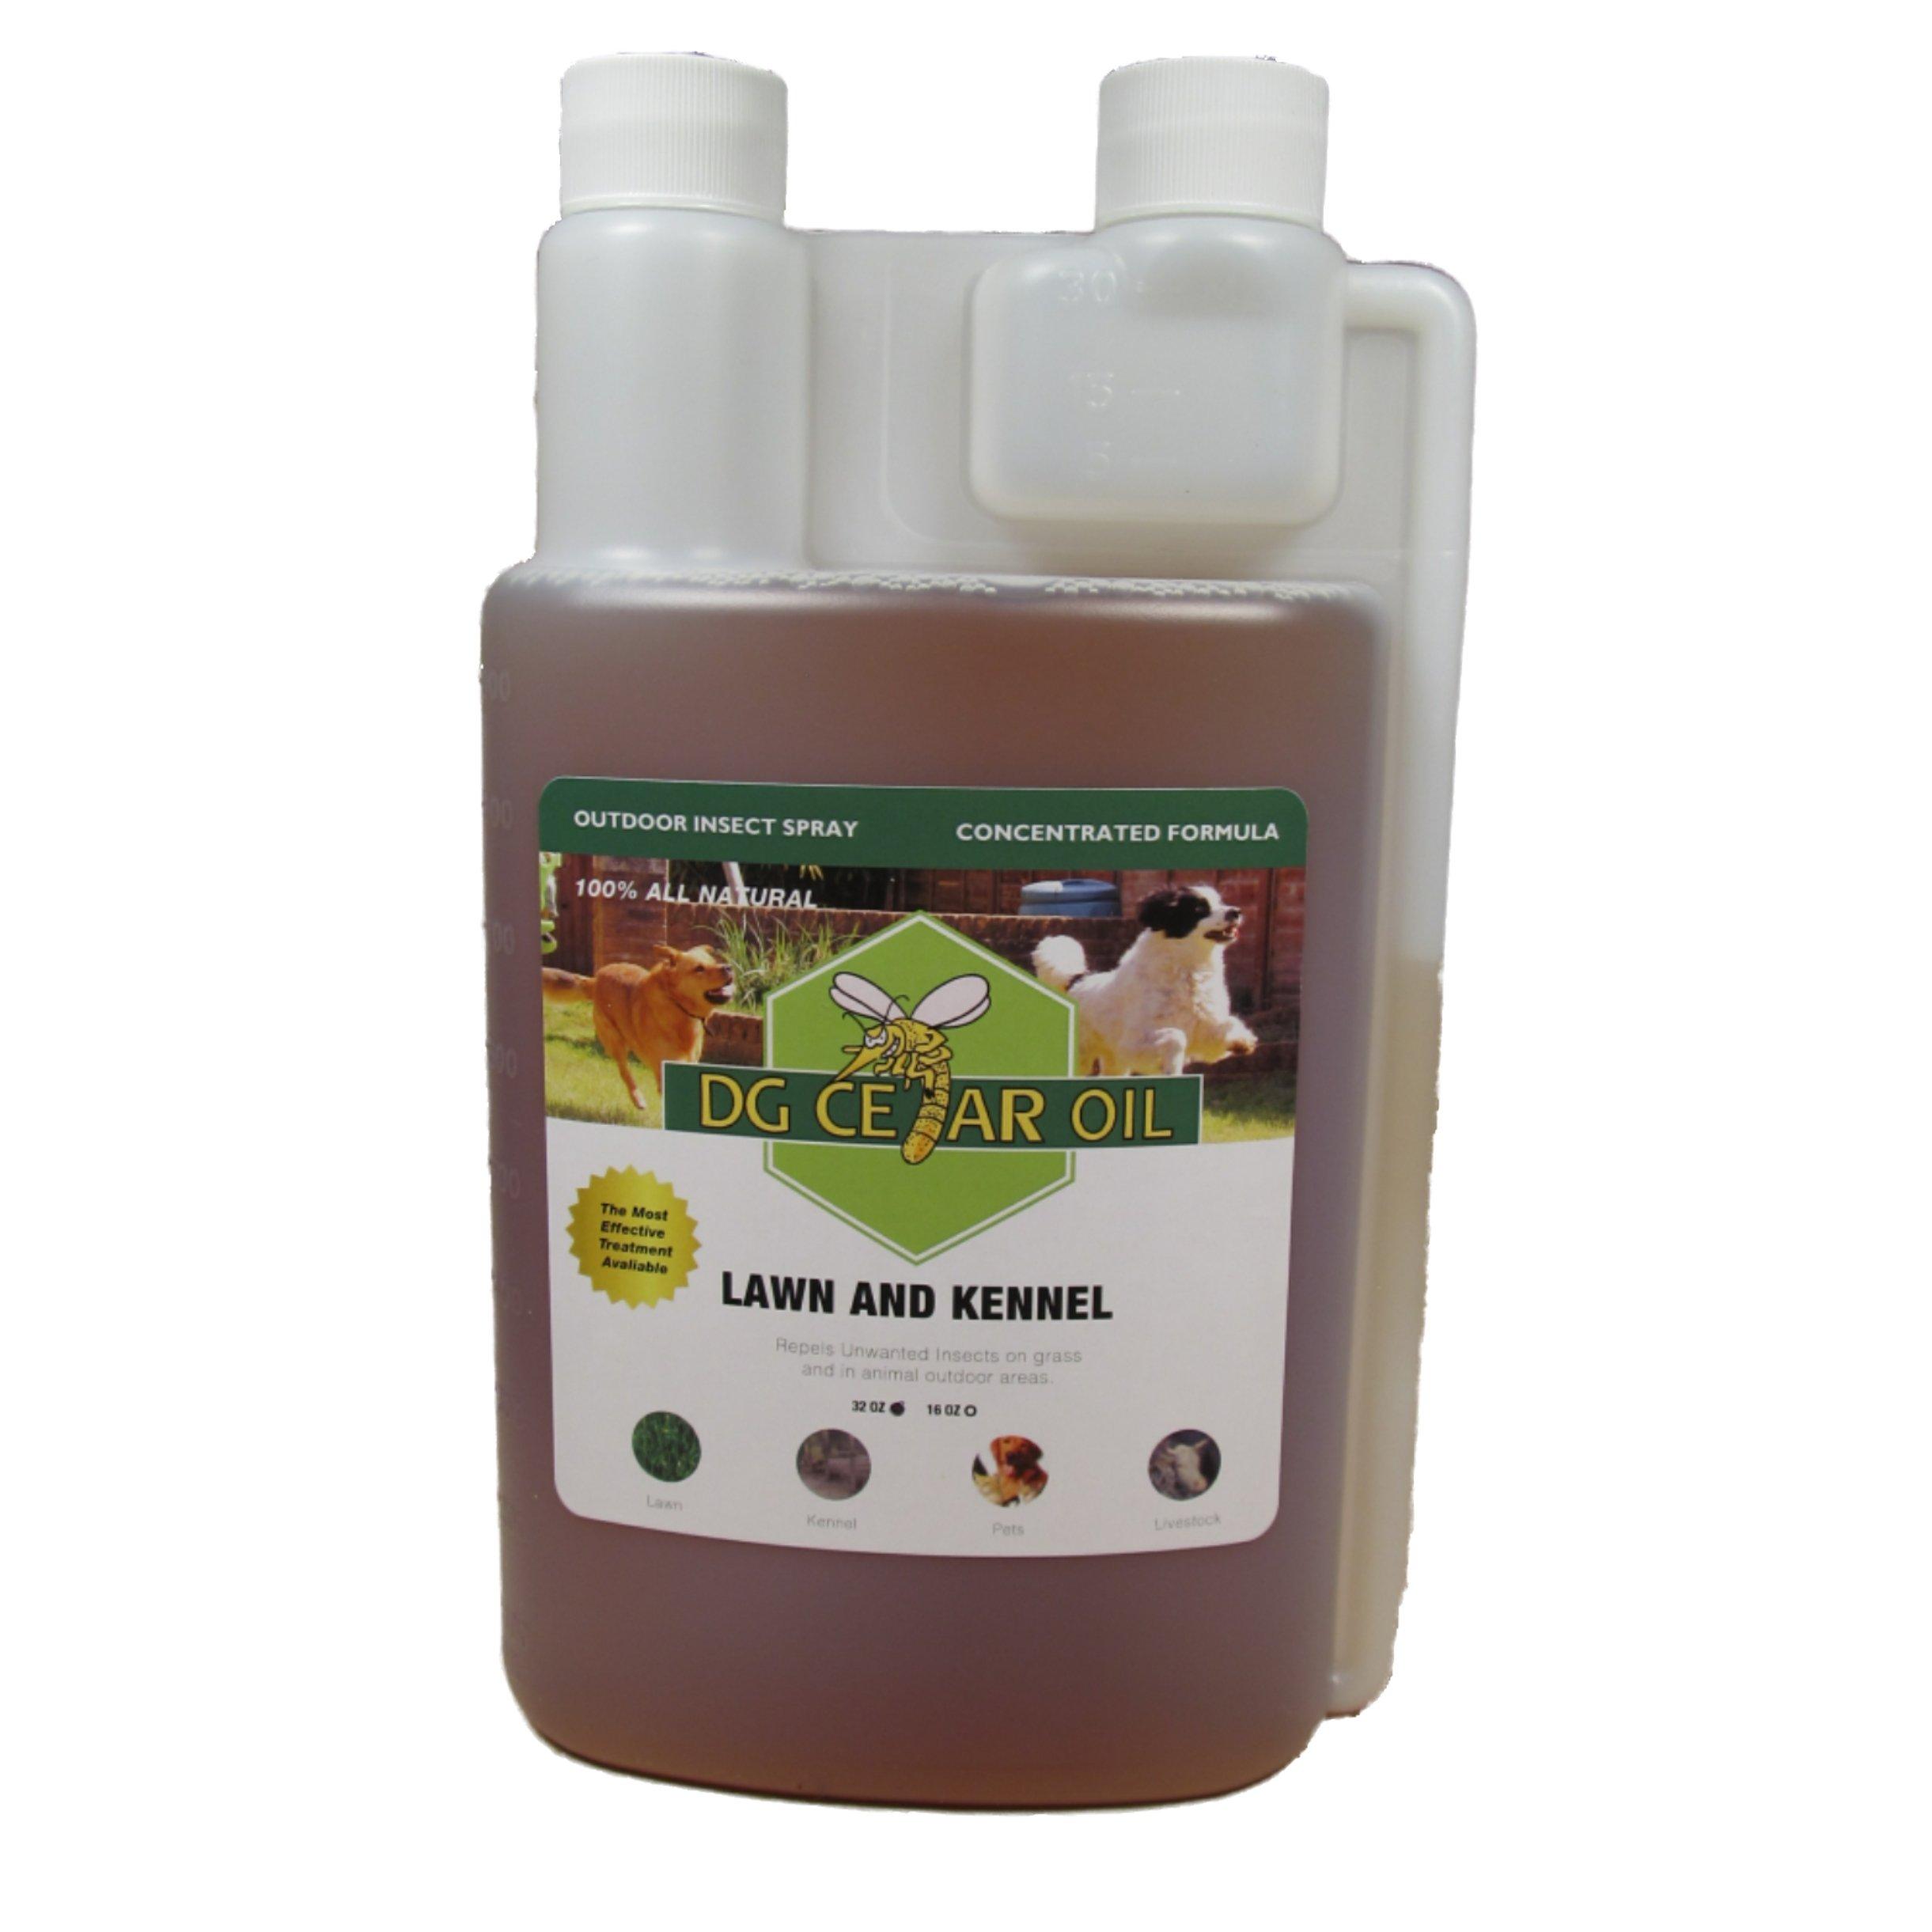 DG Cedar Oil Lawn and Kennel Concentrate Spray (32 oz) by DG Cedar Oil